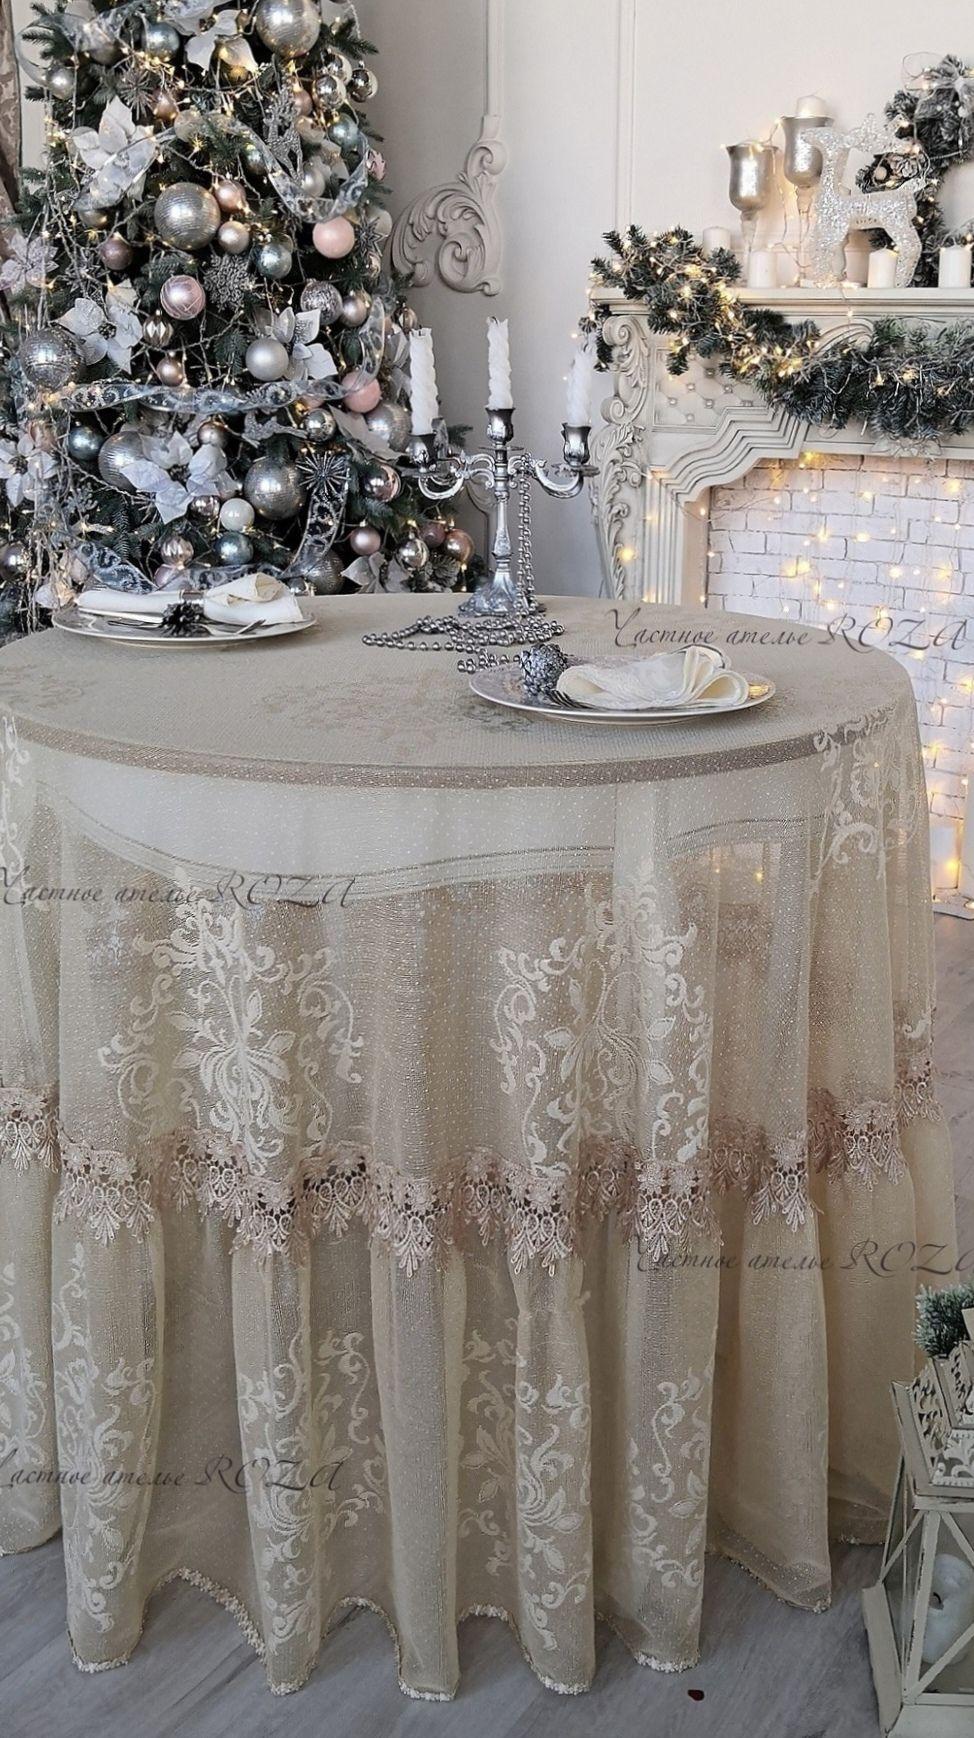 Tablecloth with lace Renaissance